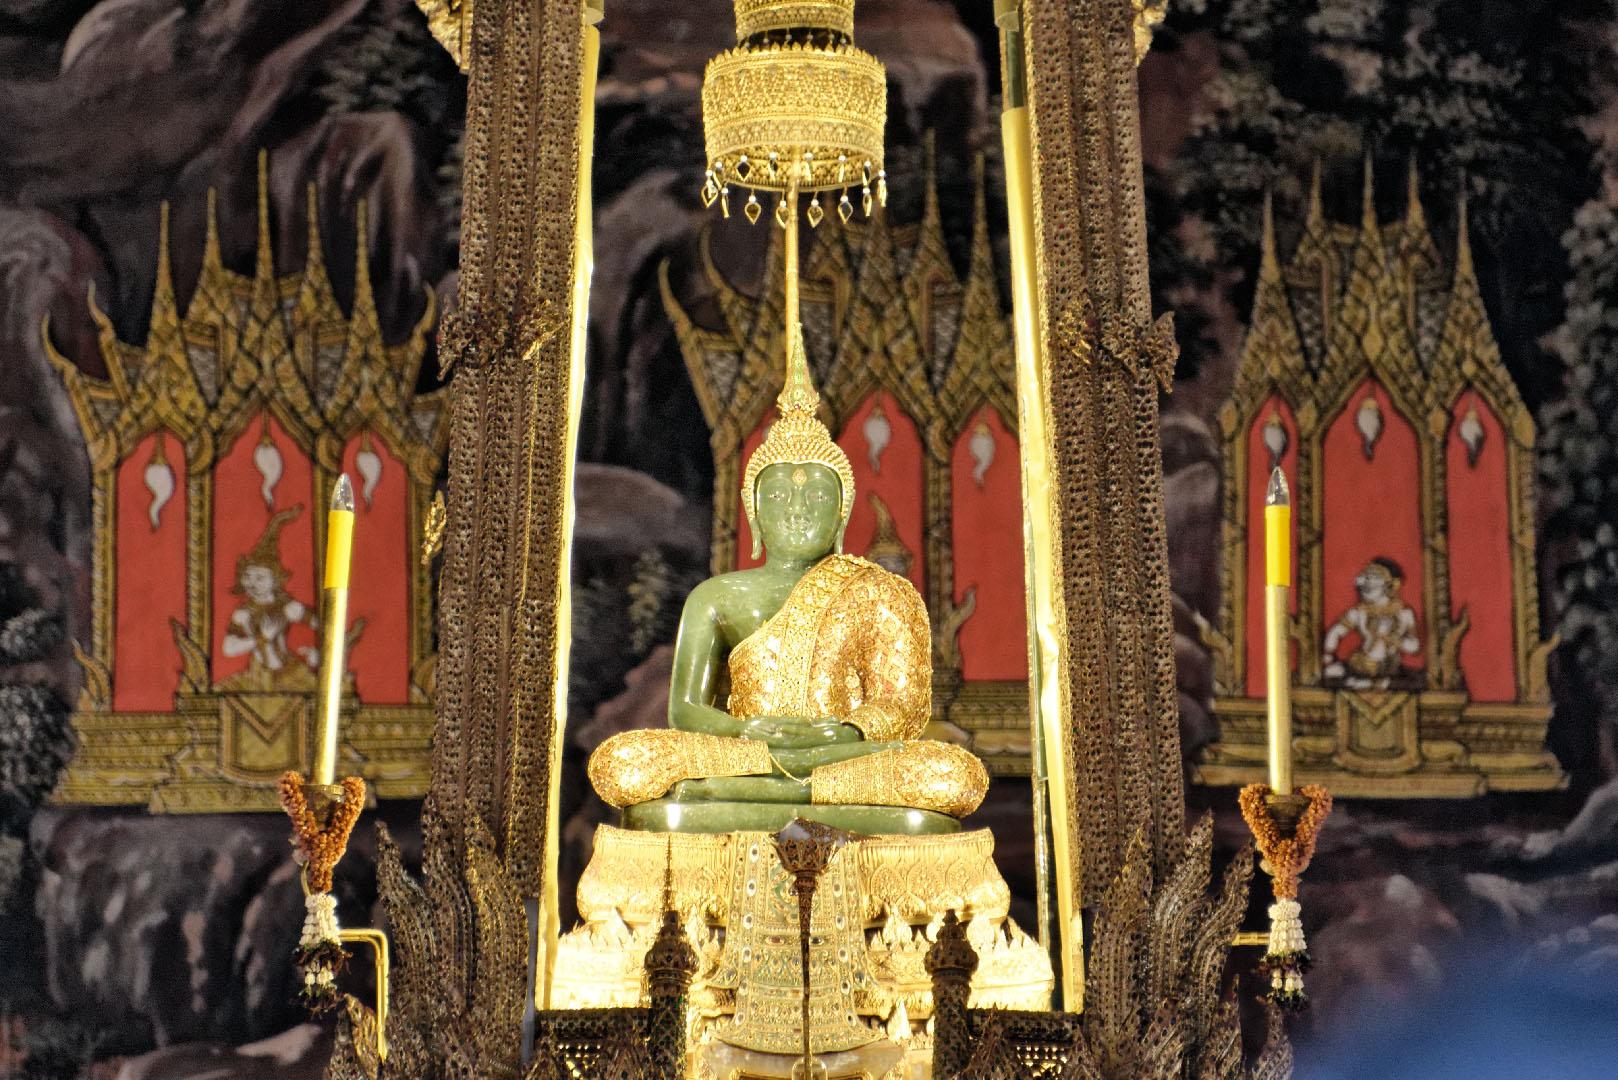 Emerald Buddha; Buddha statues in Thailand